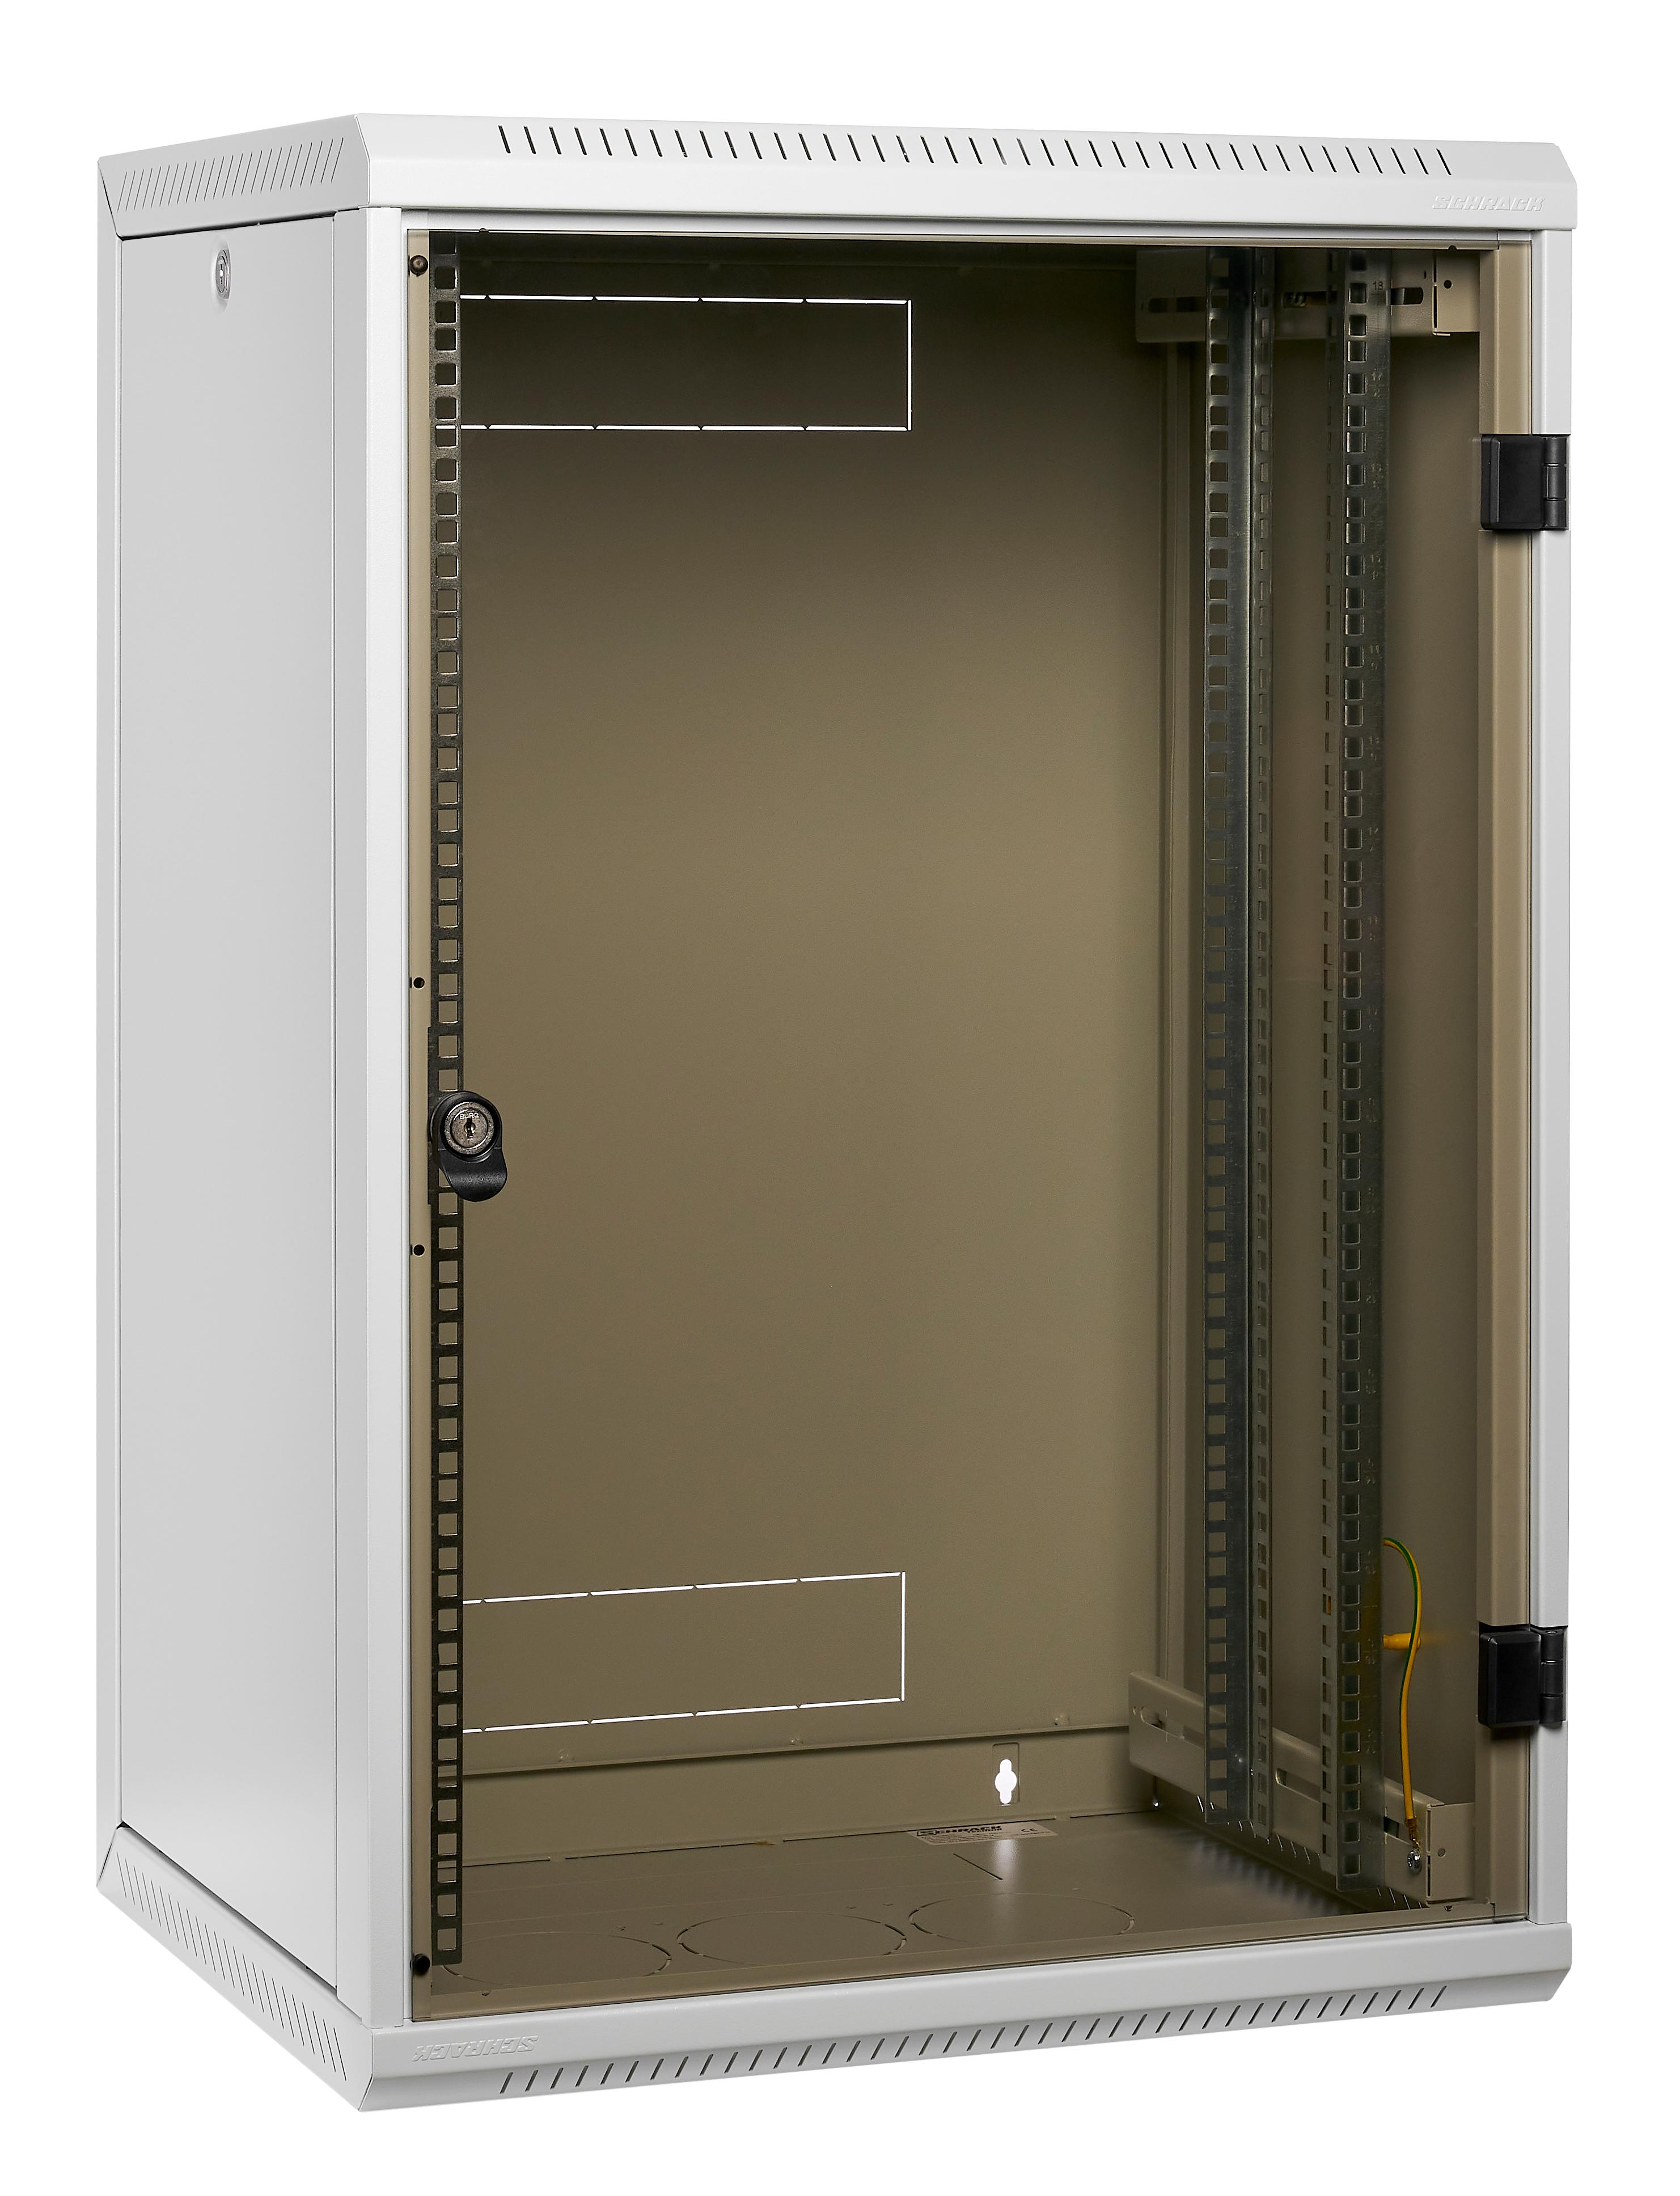 1 Stk Netzwerk-Wandschrank DW Monoblock, B600xH370xT495, 19, 6HE DW066050--